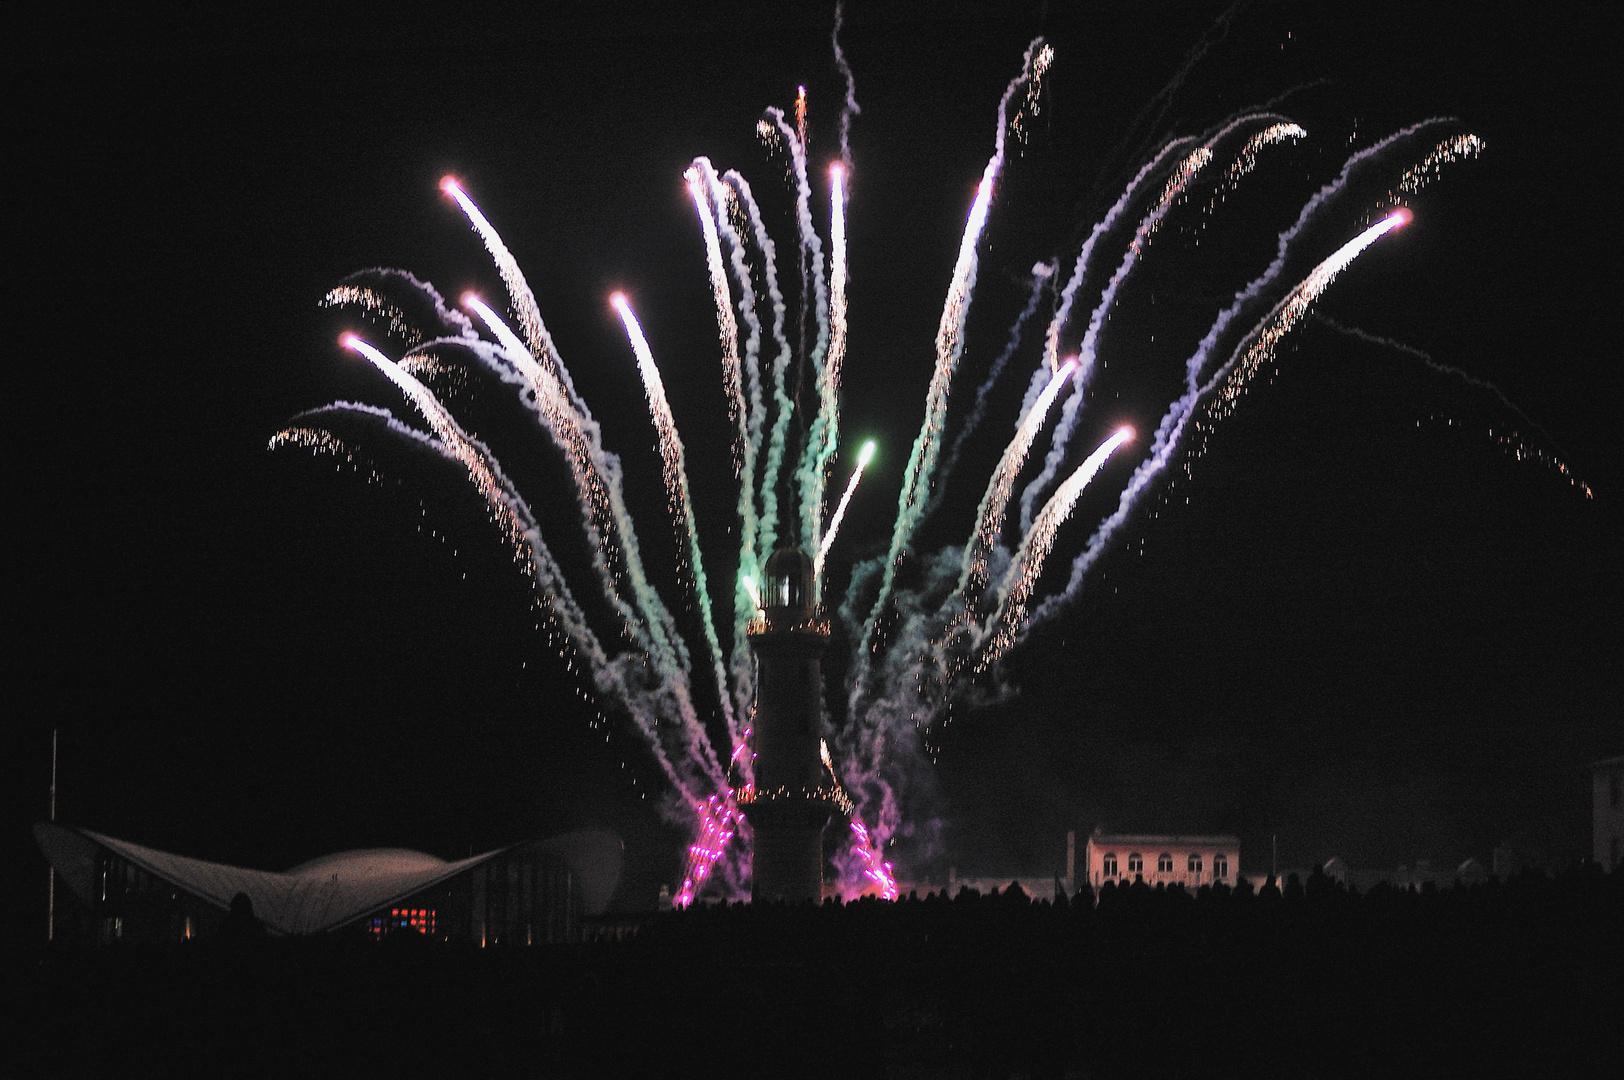 Leuchtturm in Flammen 2010